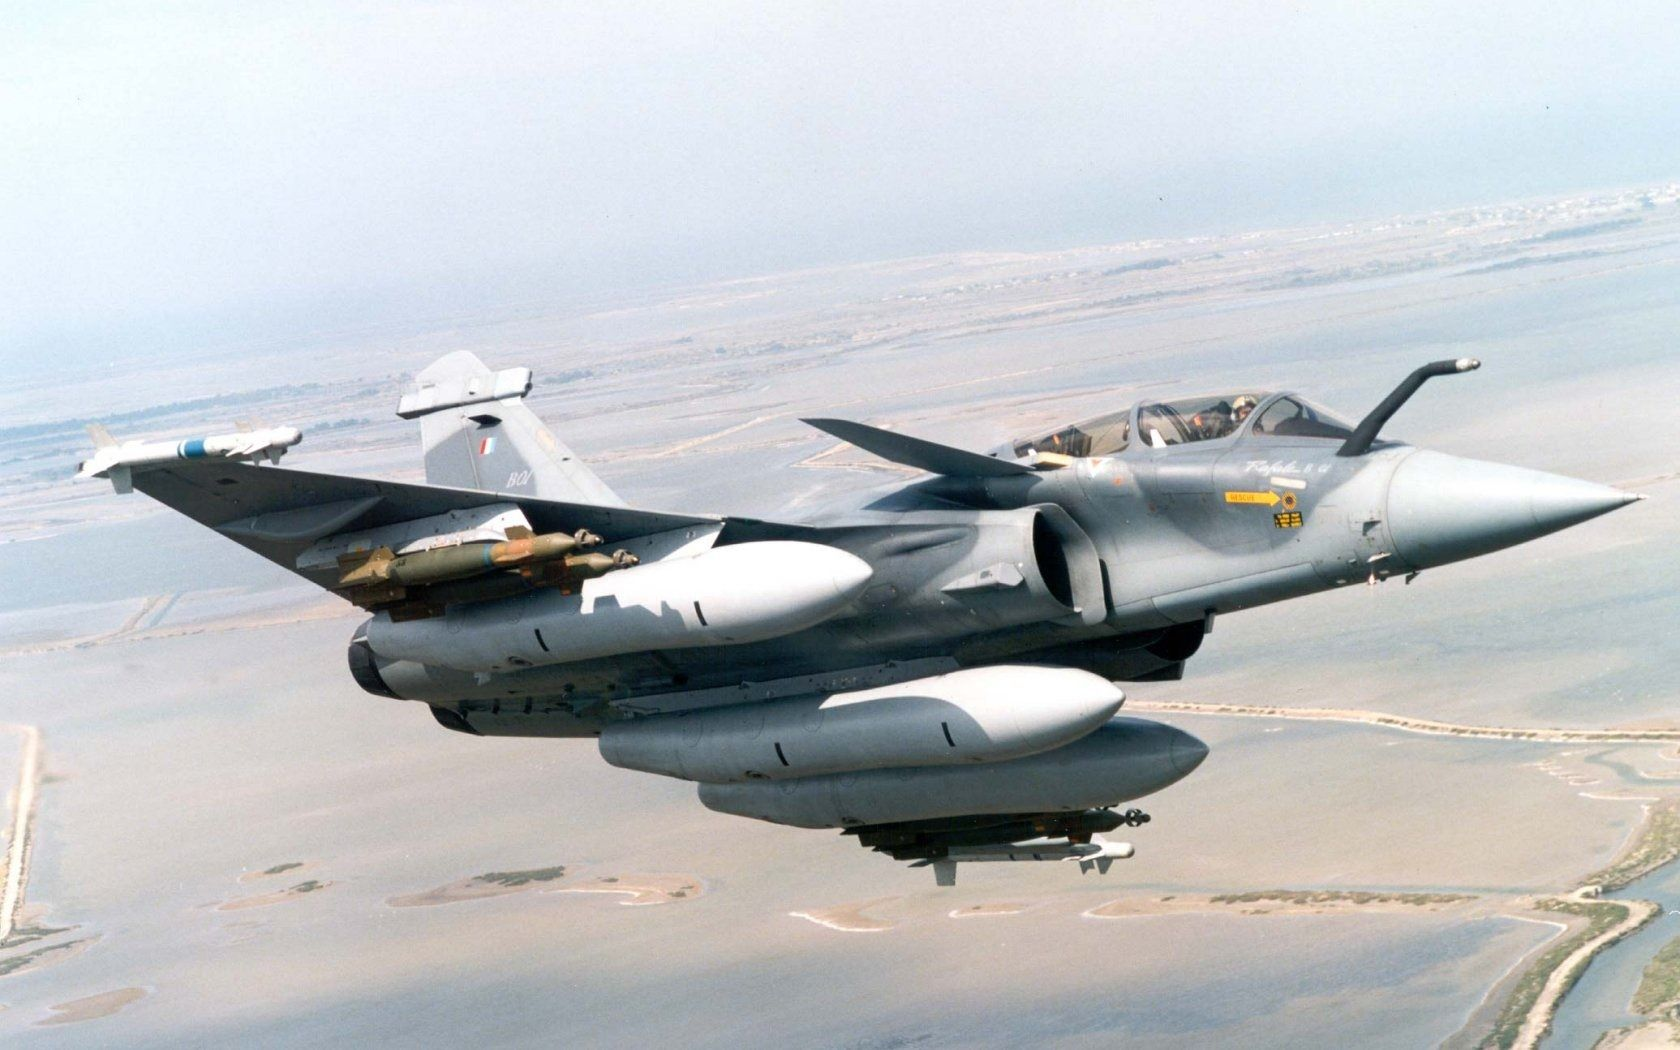 Dassault Rafale Widescreen Wallpaper Best Fighter Jet